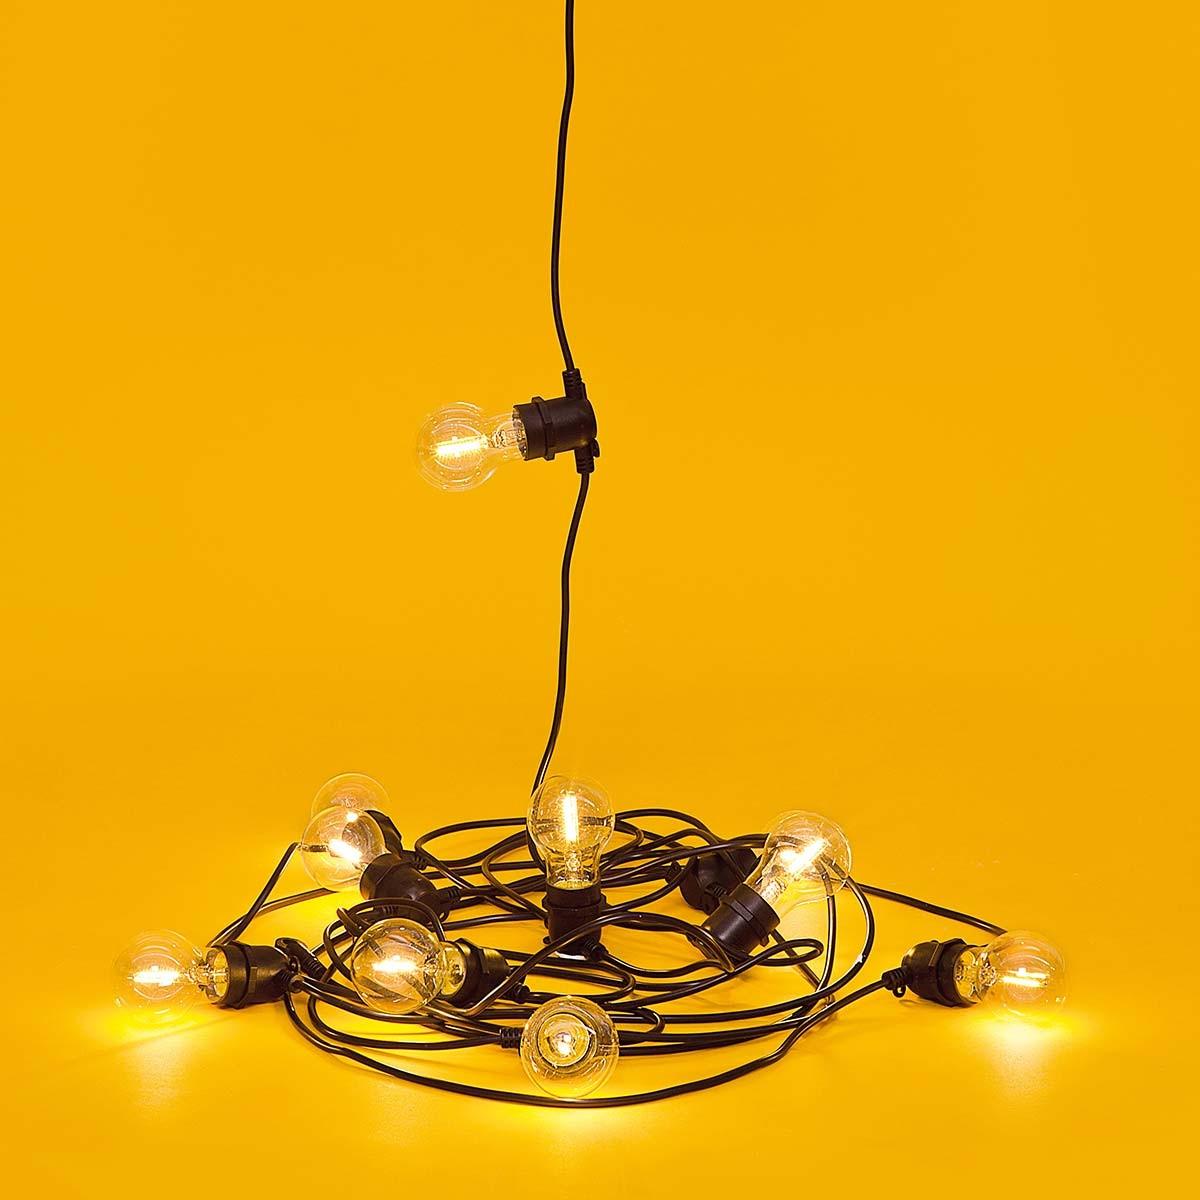 The illuminating Bella Vista outdoor LED lights by Seletti